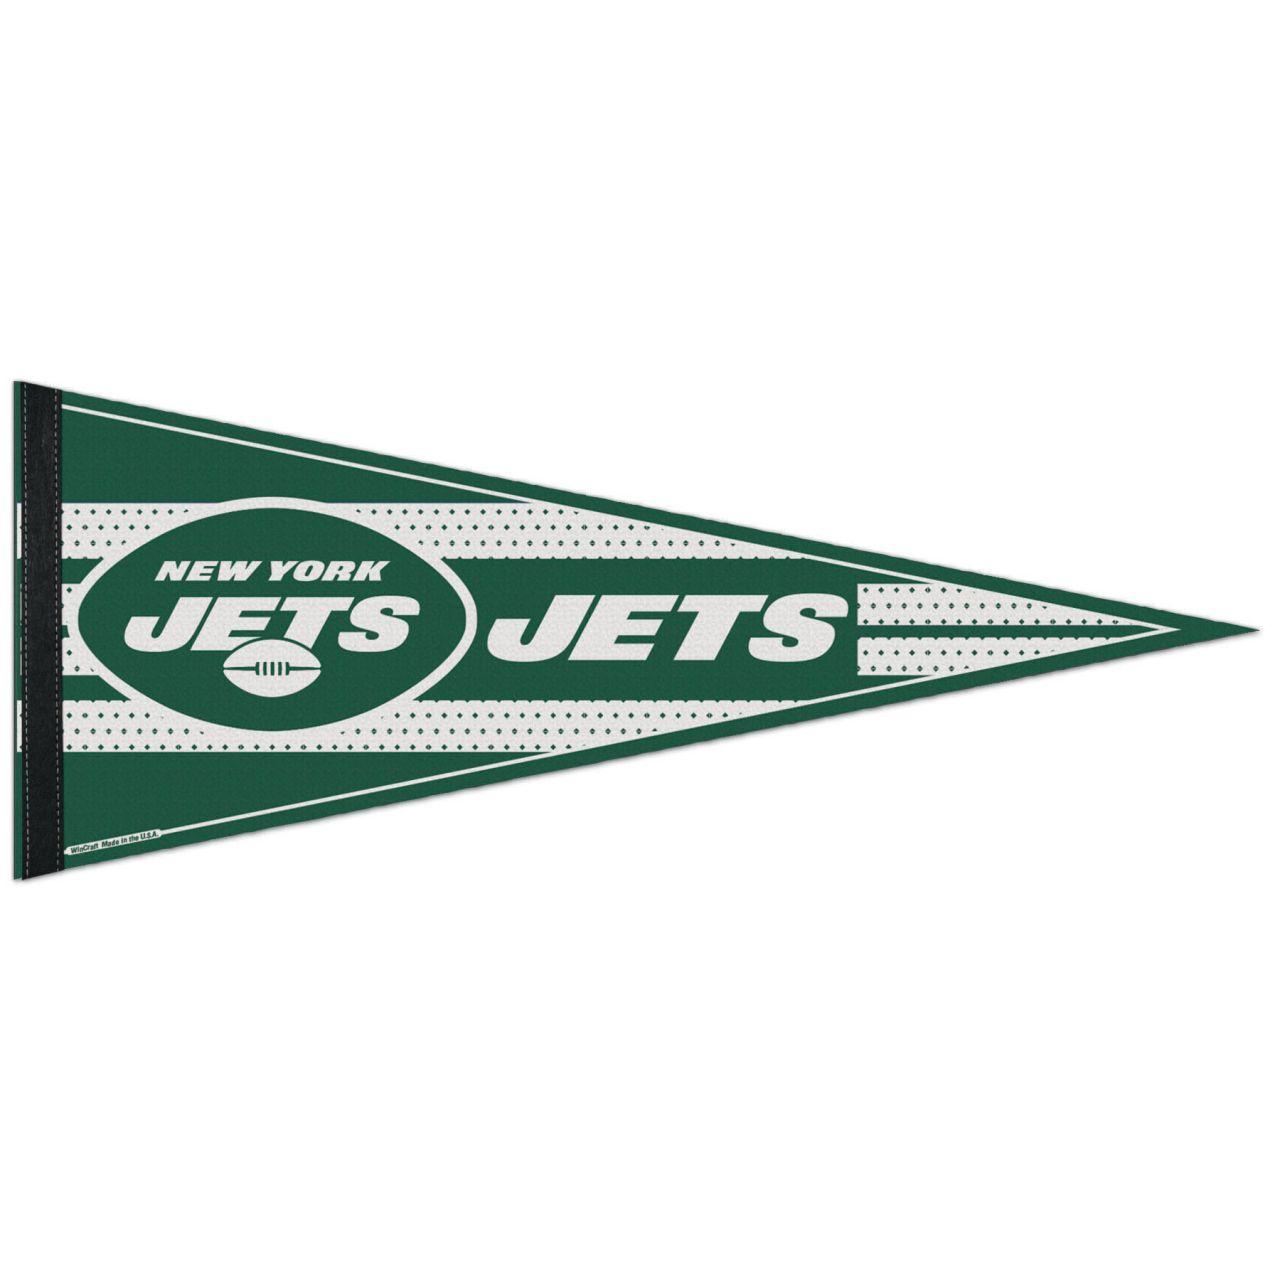 amfoo - Wincraft NFL Filz Wimpel 75x30cm - New York Jets 2019